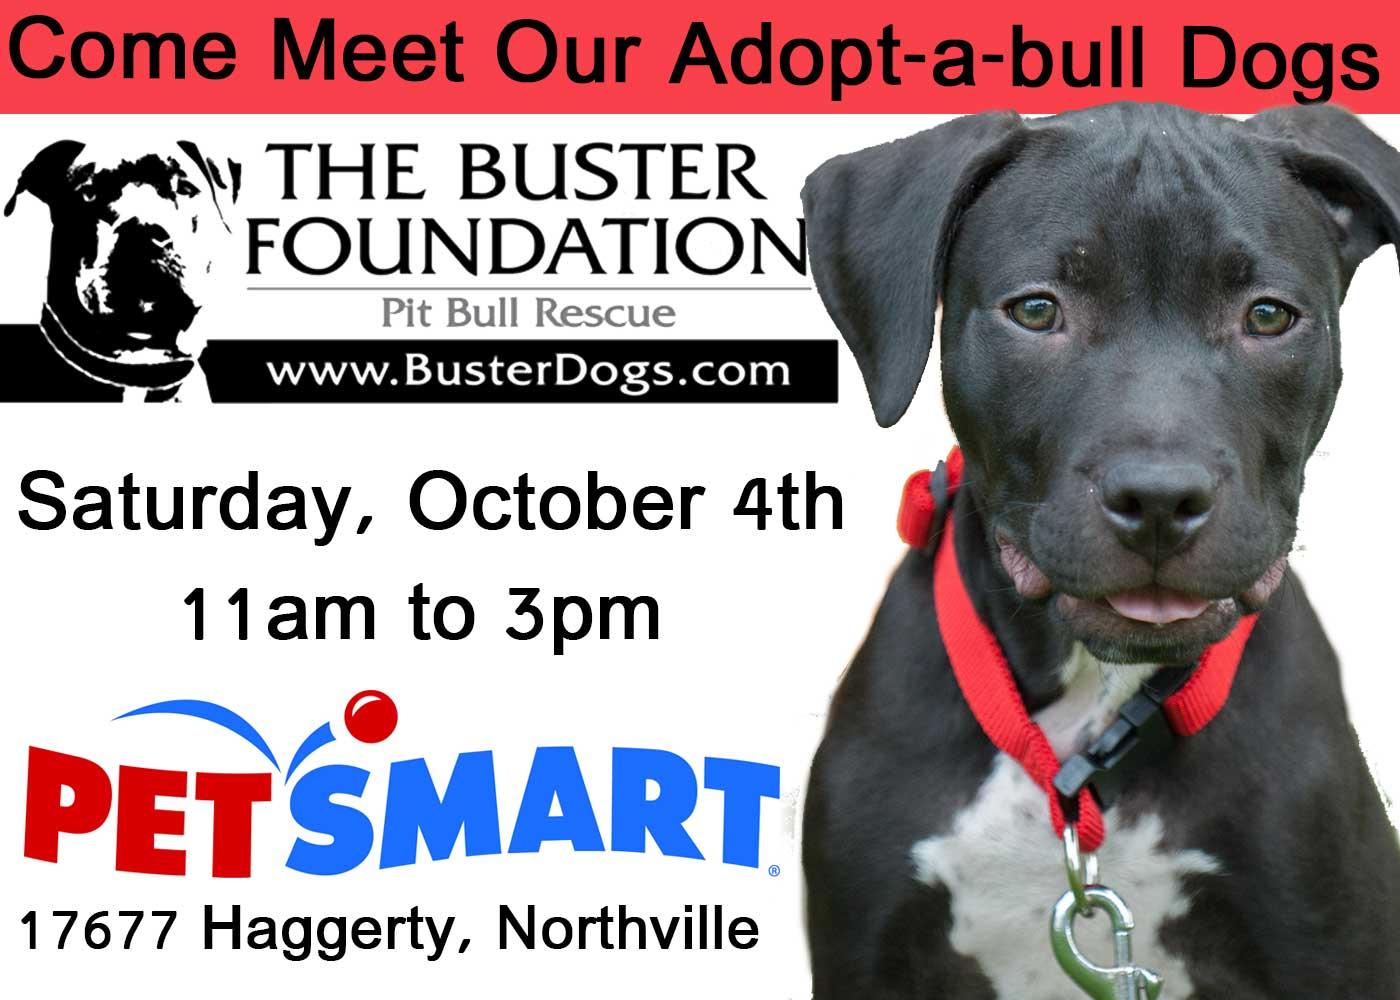 Petsmart Oct 4 Adoption